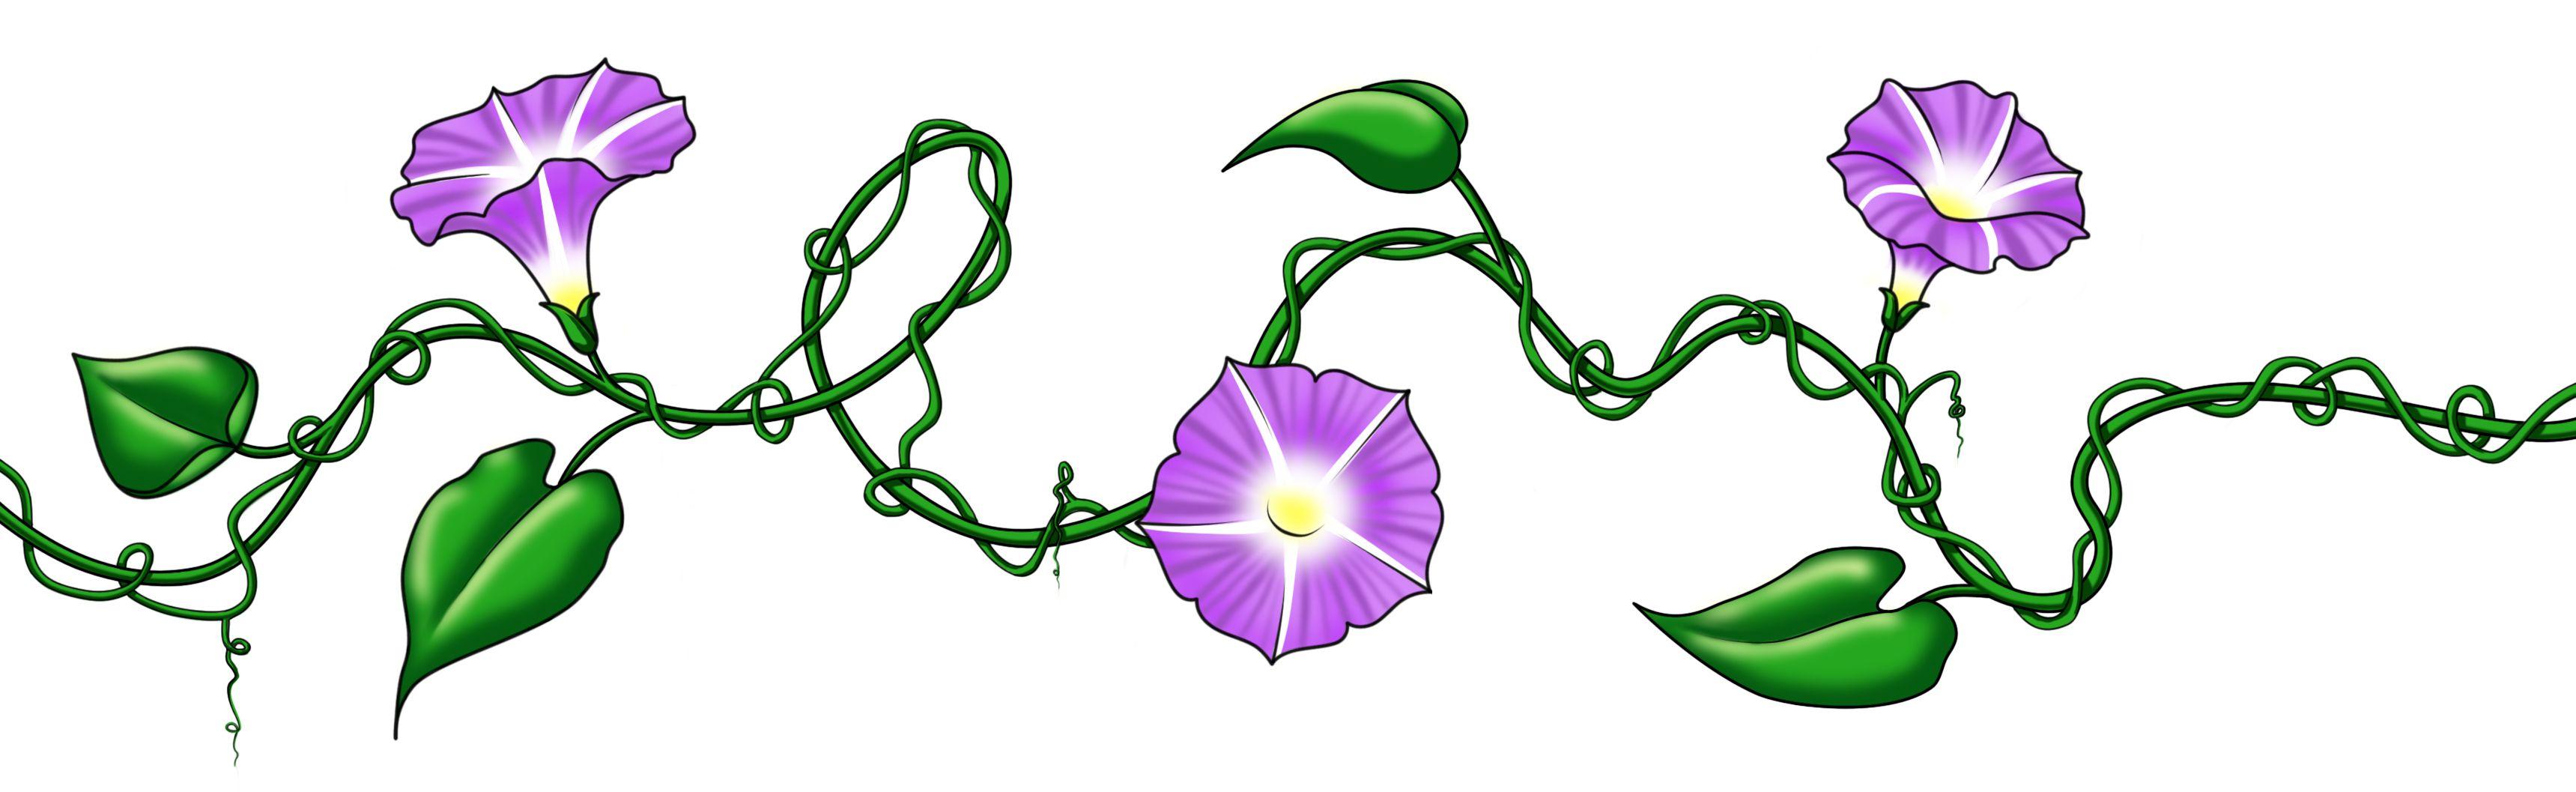 Morning Glory Vine Tattoo Design Ankle tatoos Pinterest